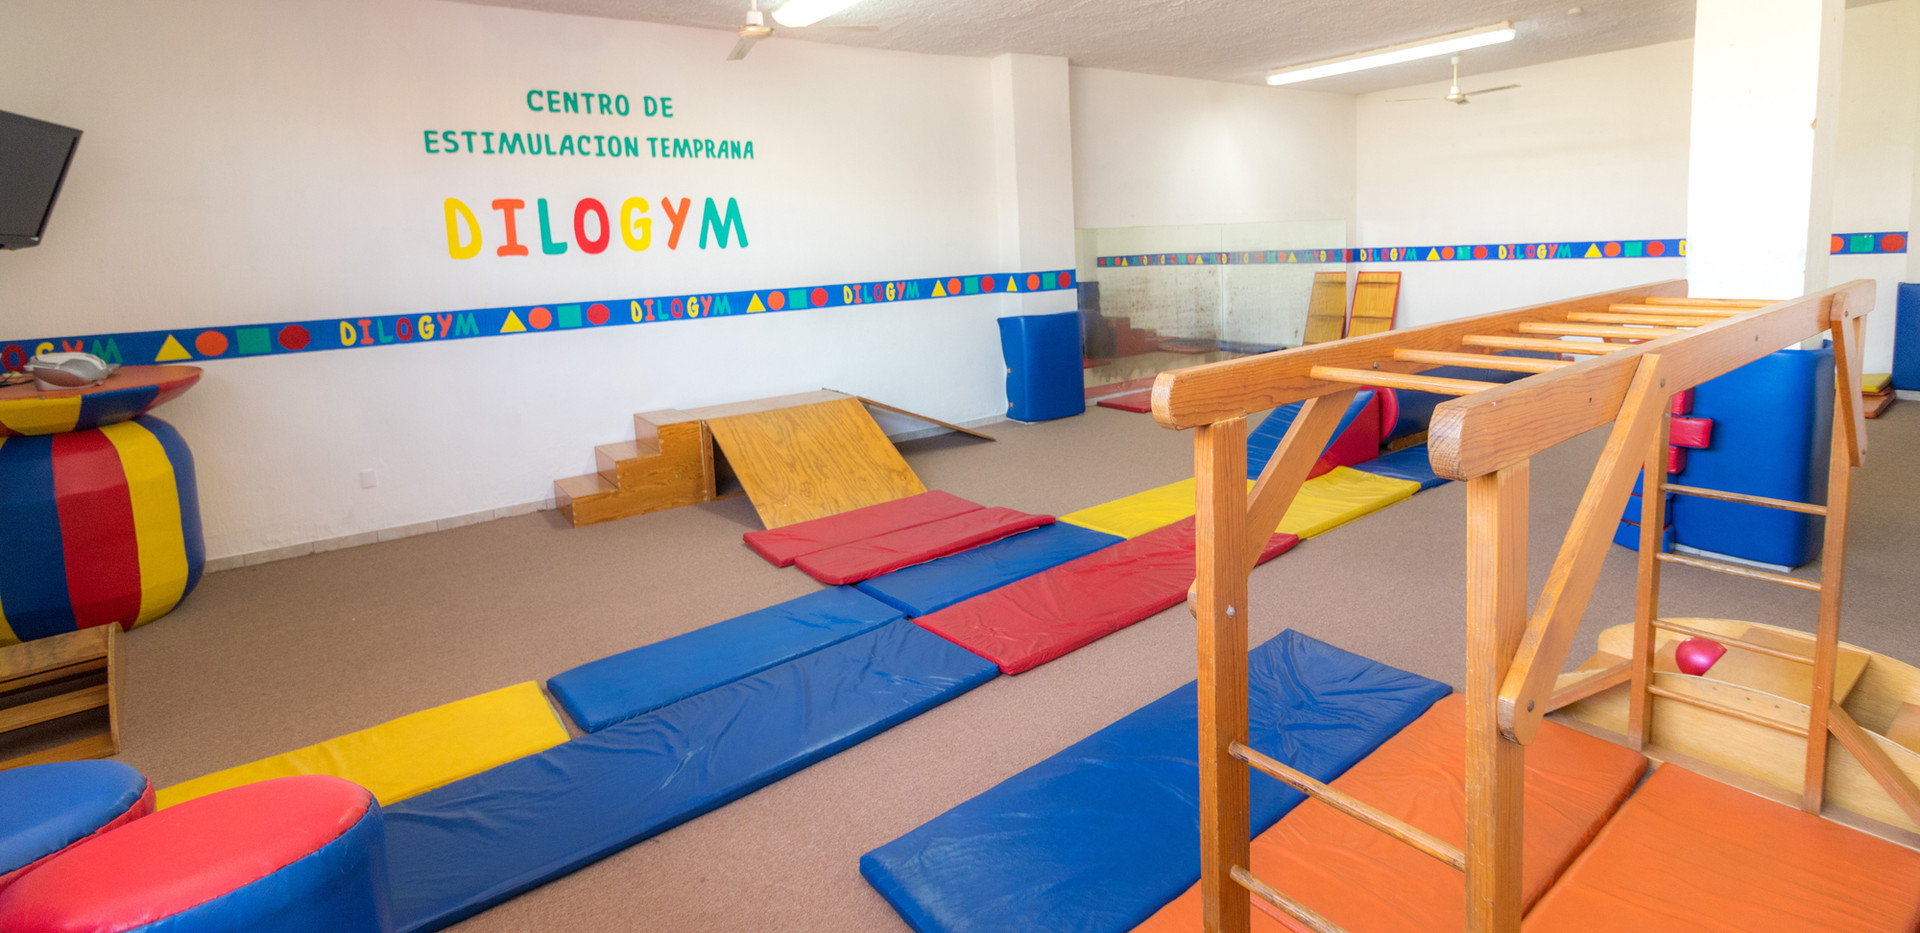 Colegio Bilingue - Gym JSB